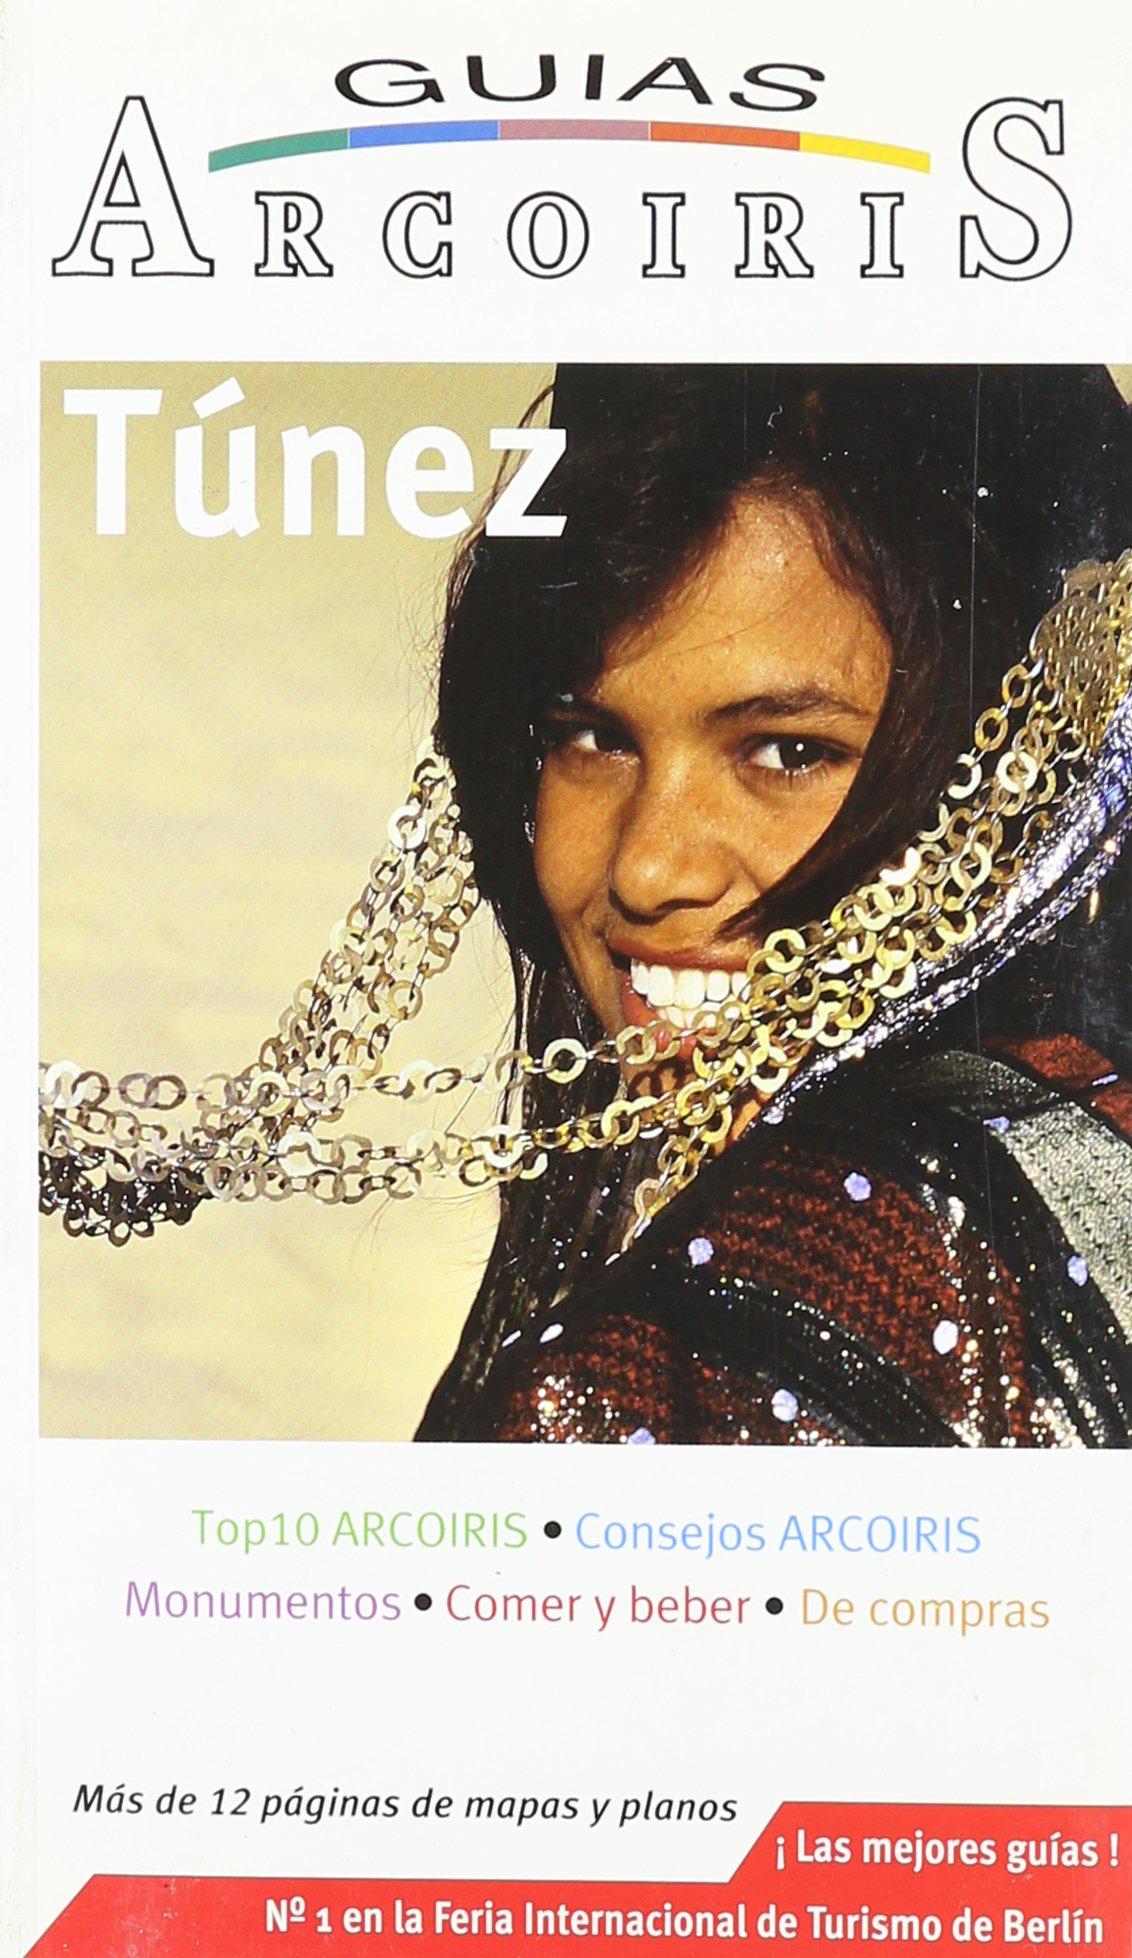 Tunez/ Tunisia Travel Guide: Guia de Viaje Practica (Guias ARCOIRIS) (Spanish Edition)